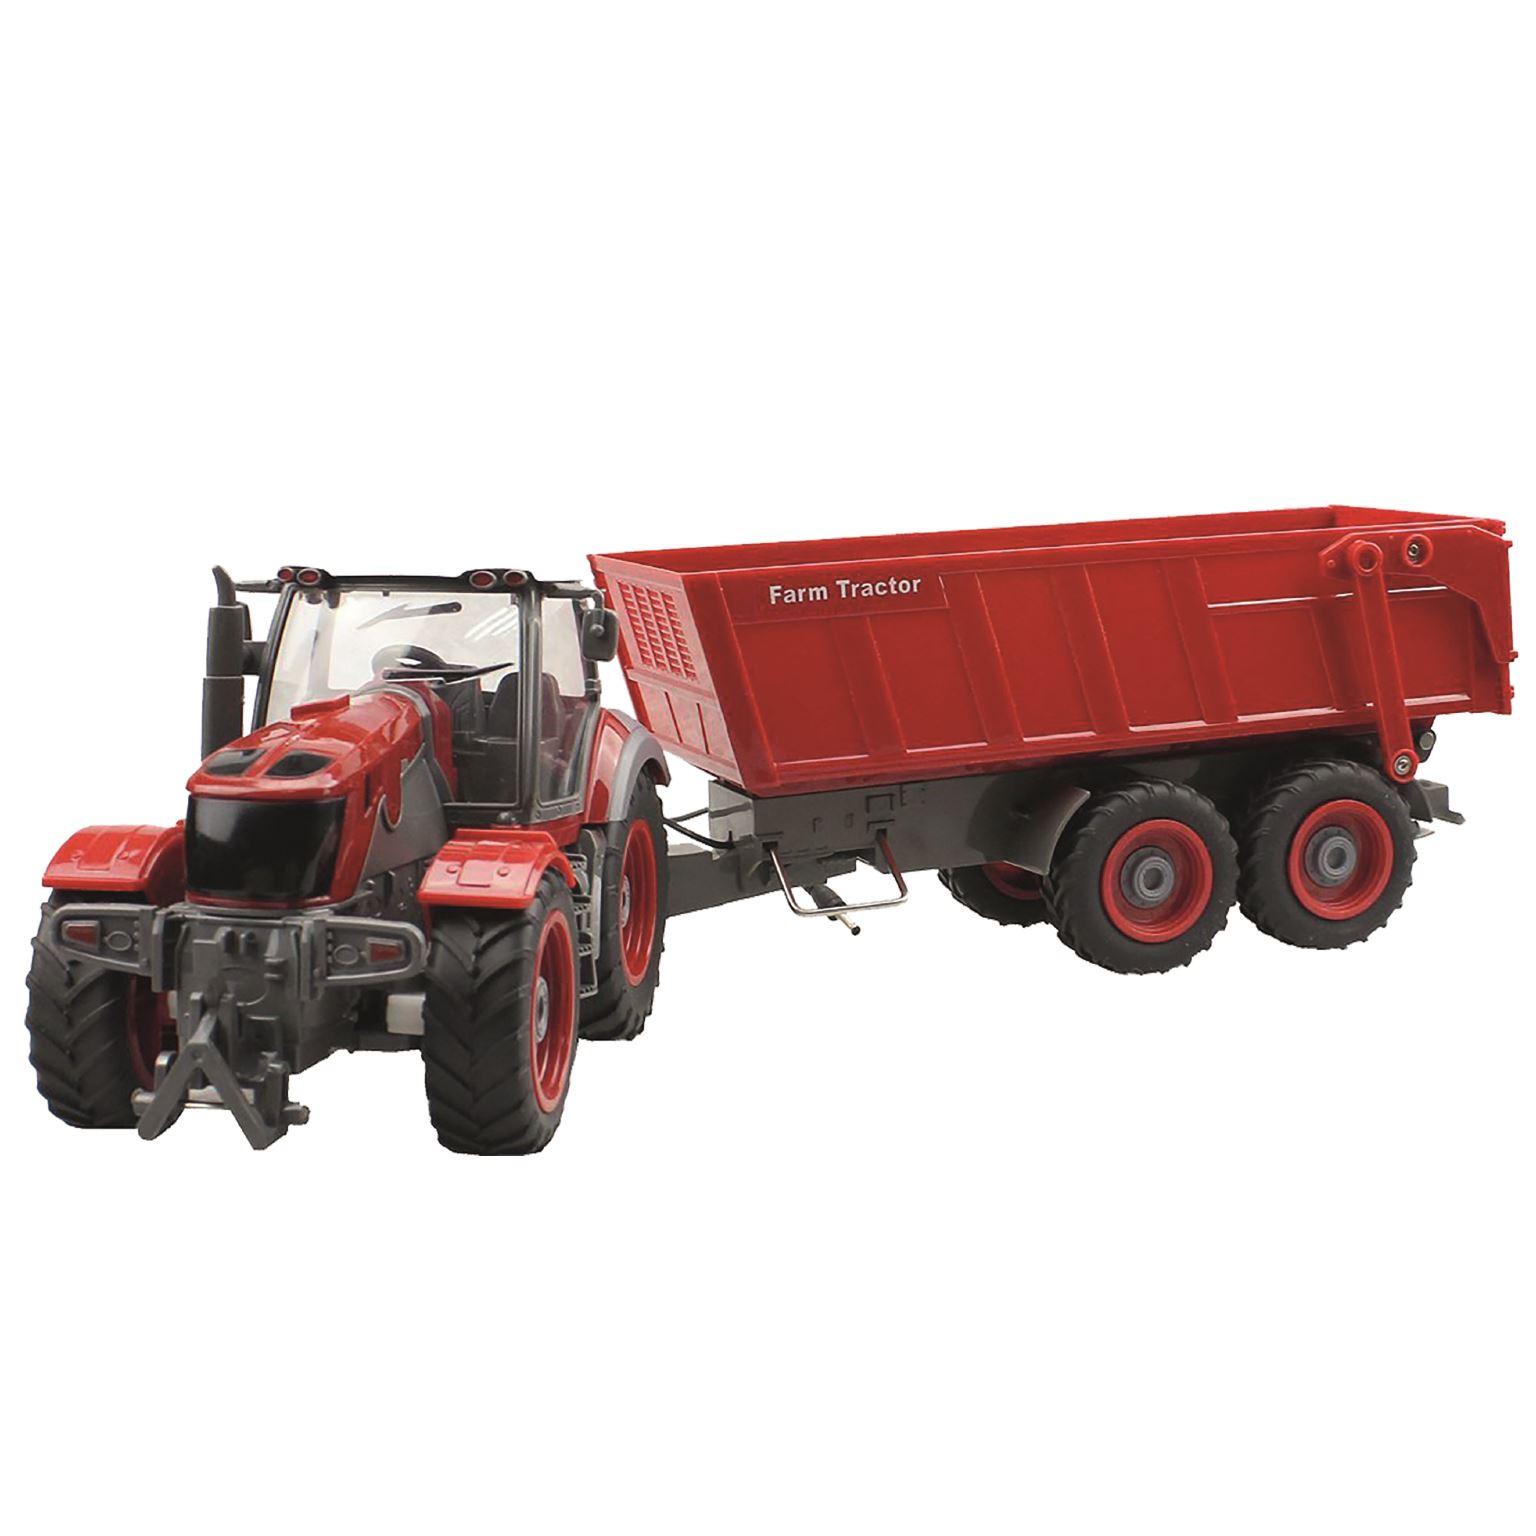 Remote Control Tractor Trailer Trucks : Large farm tractor plus trailer remote control rc toy